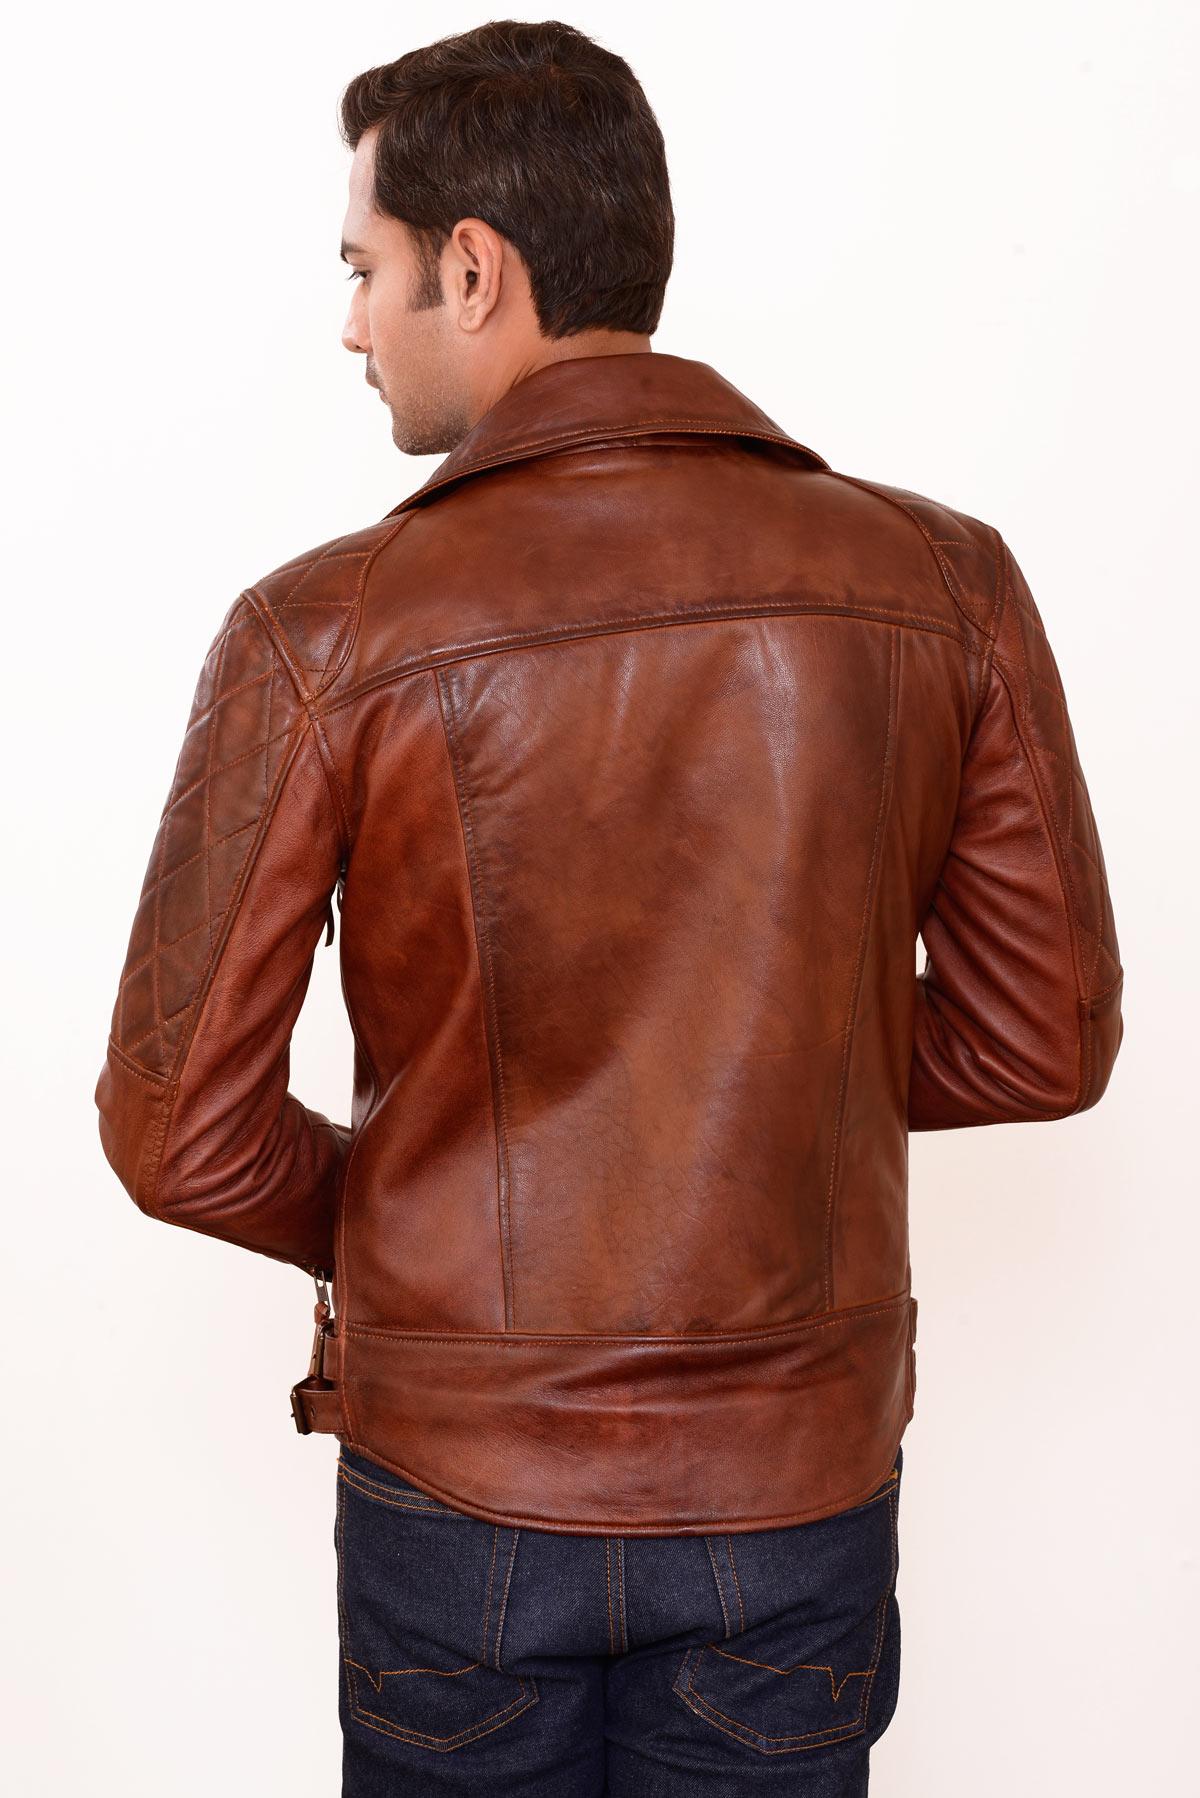 genuine leather jacket made in korea